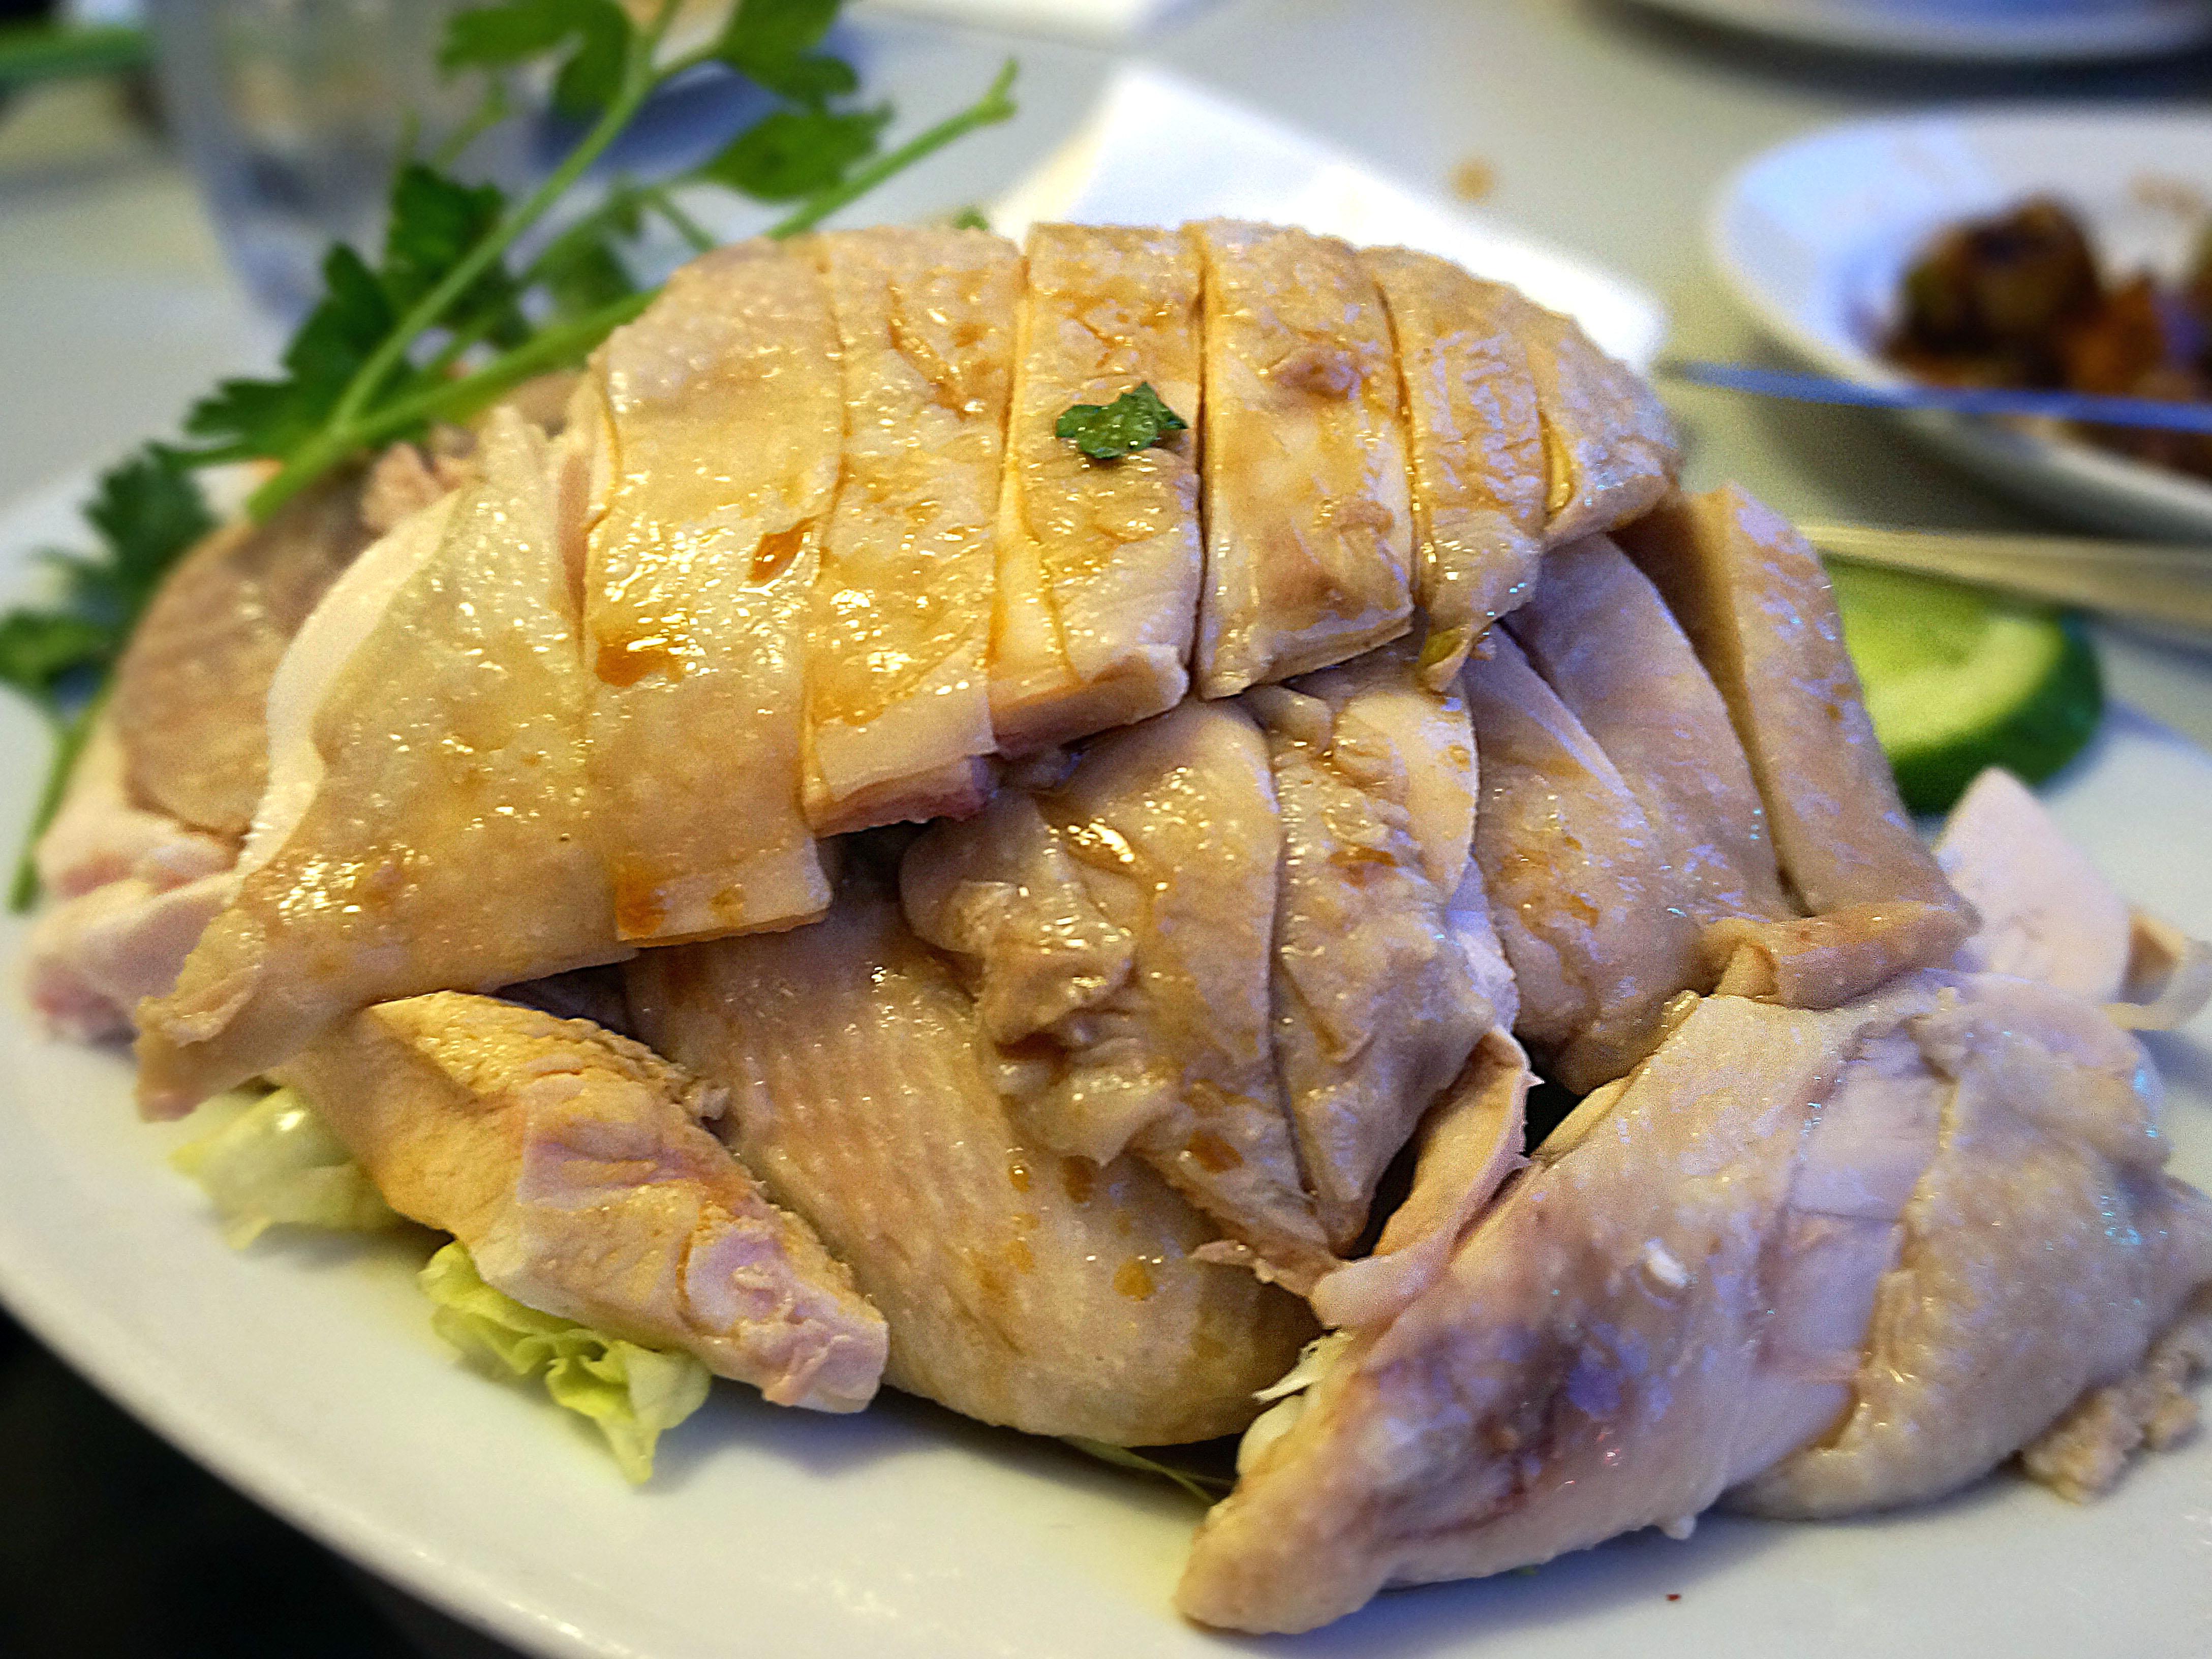 Boneless Half Hainanese Chicken - 'Rice not included' {$25}